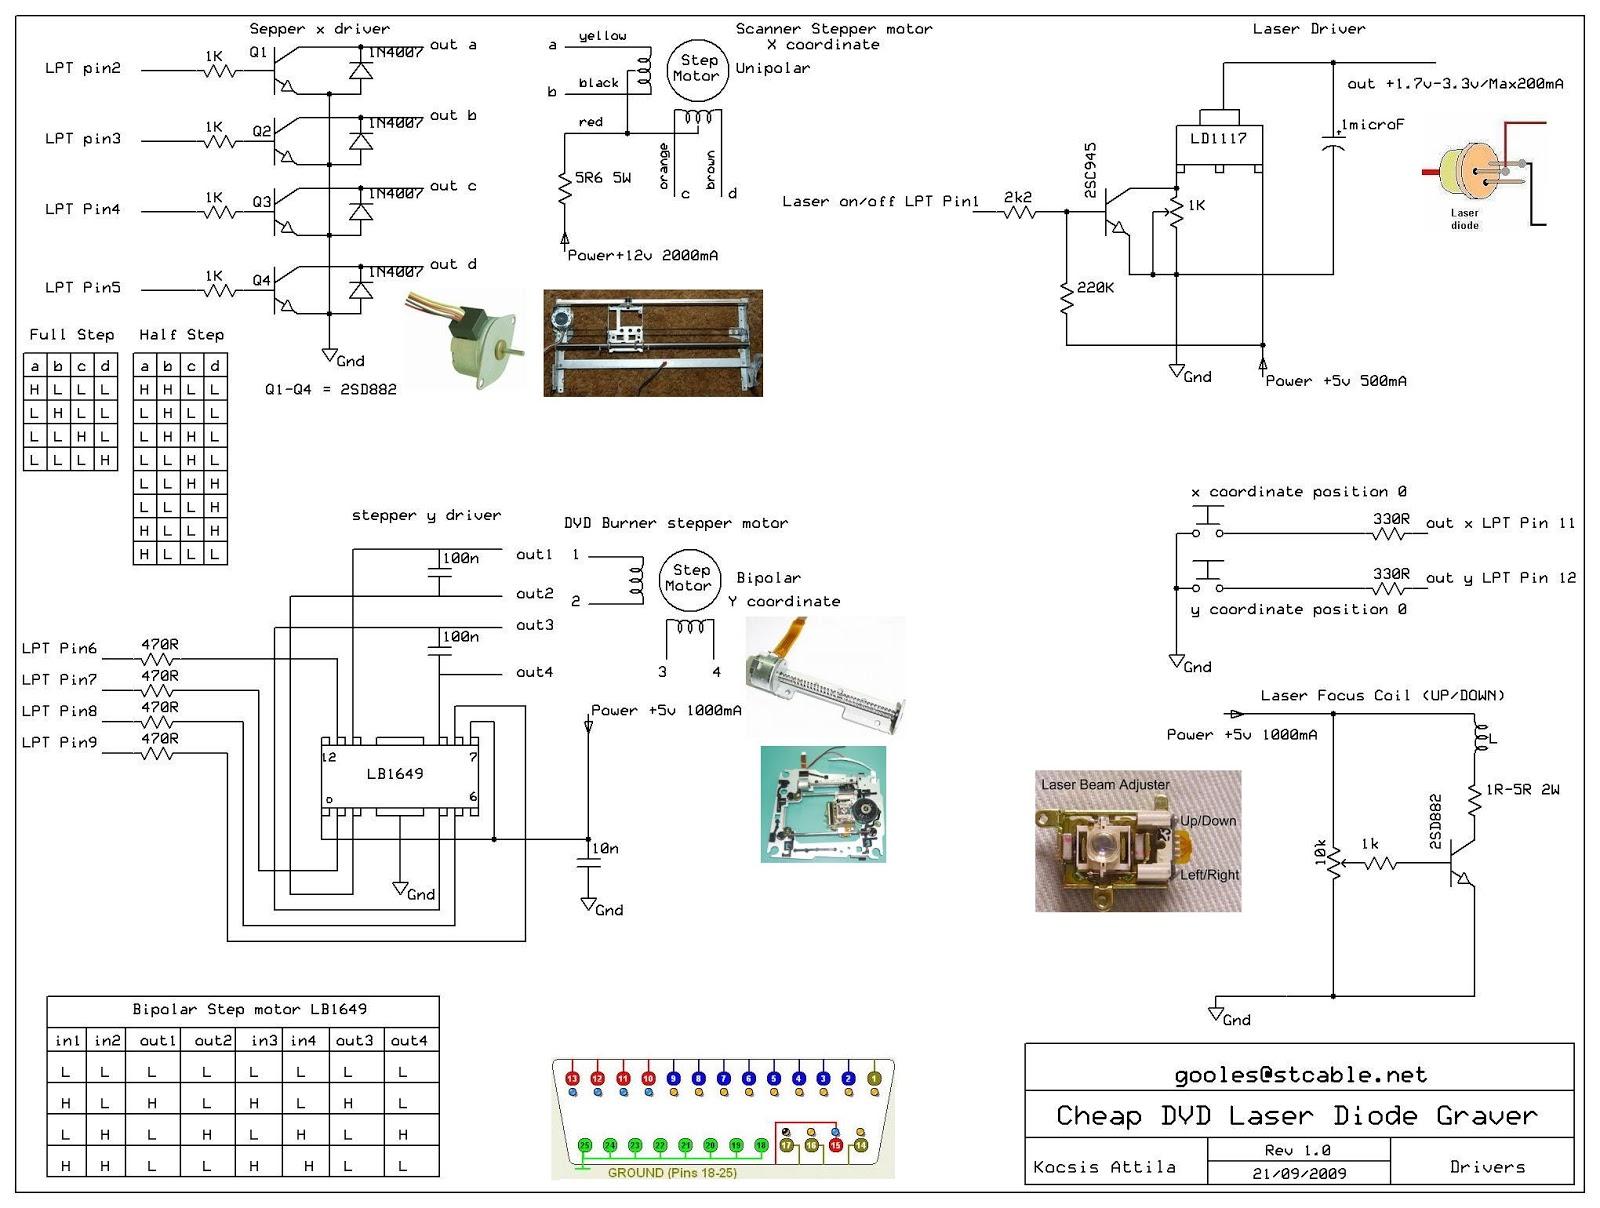 class b wiring diagram for laser [ 1600 x 1208 Pixel ]